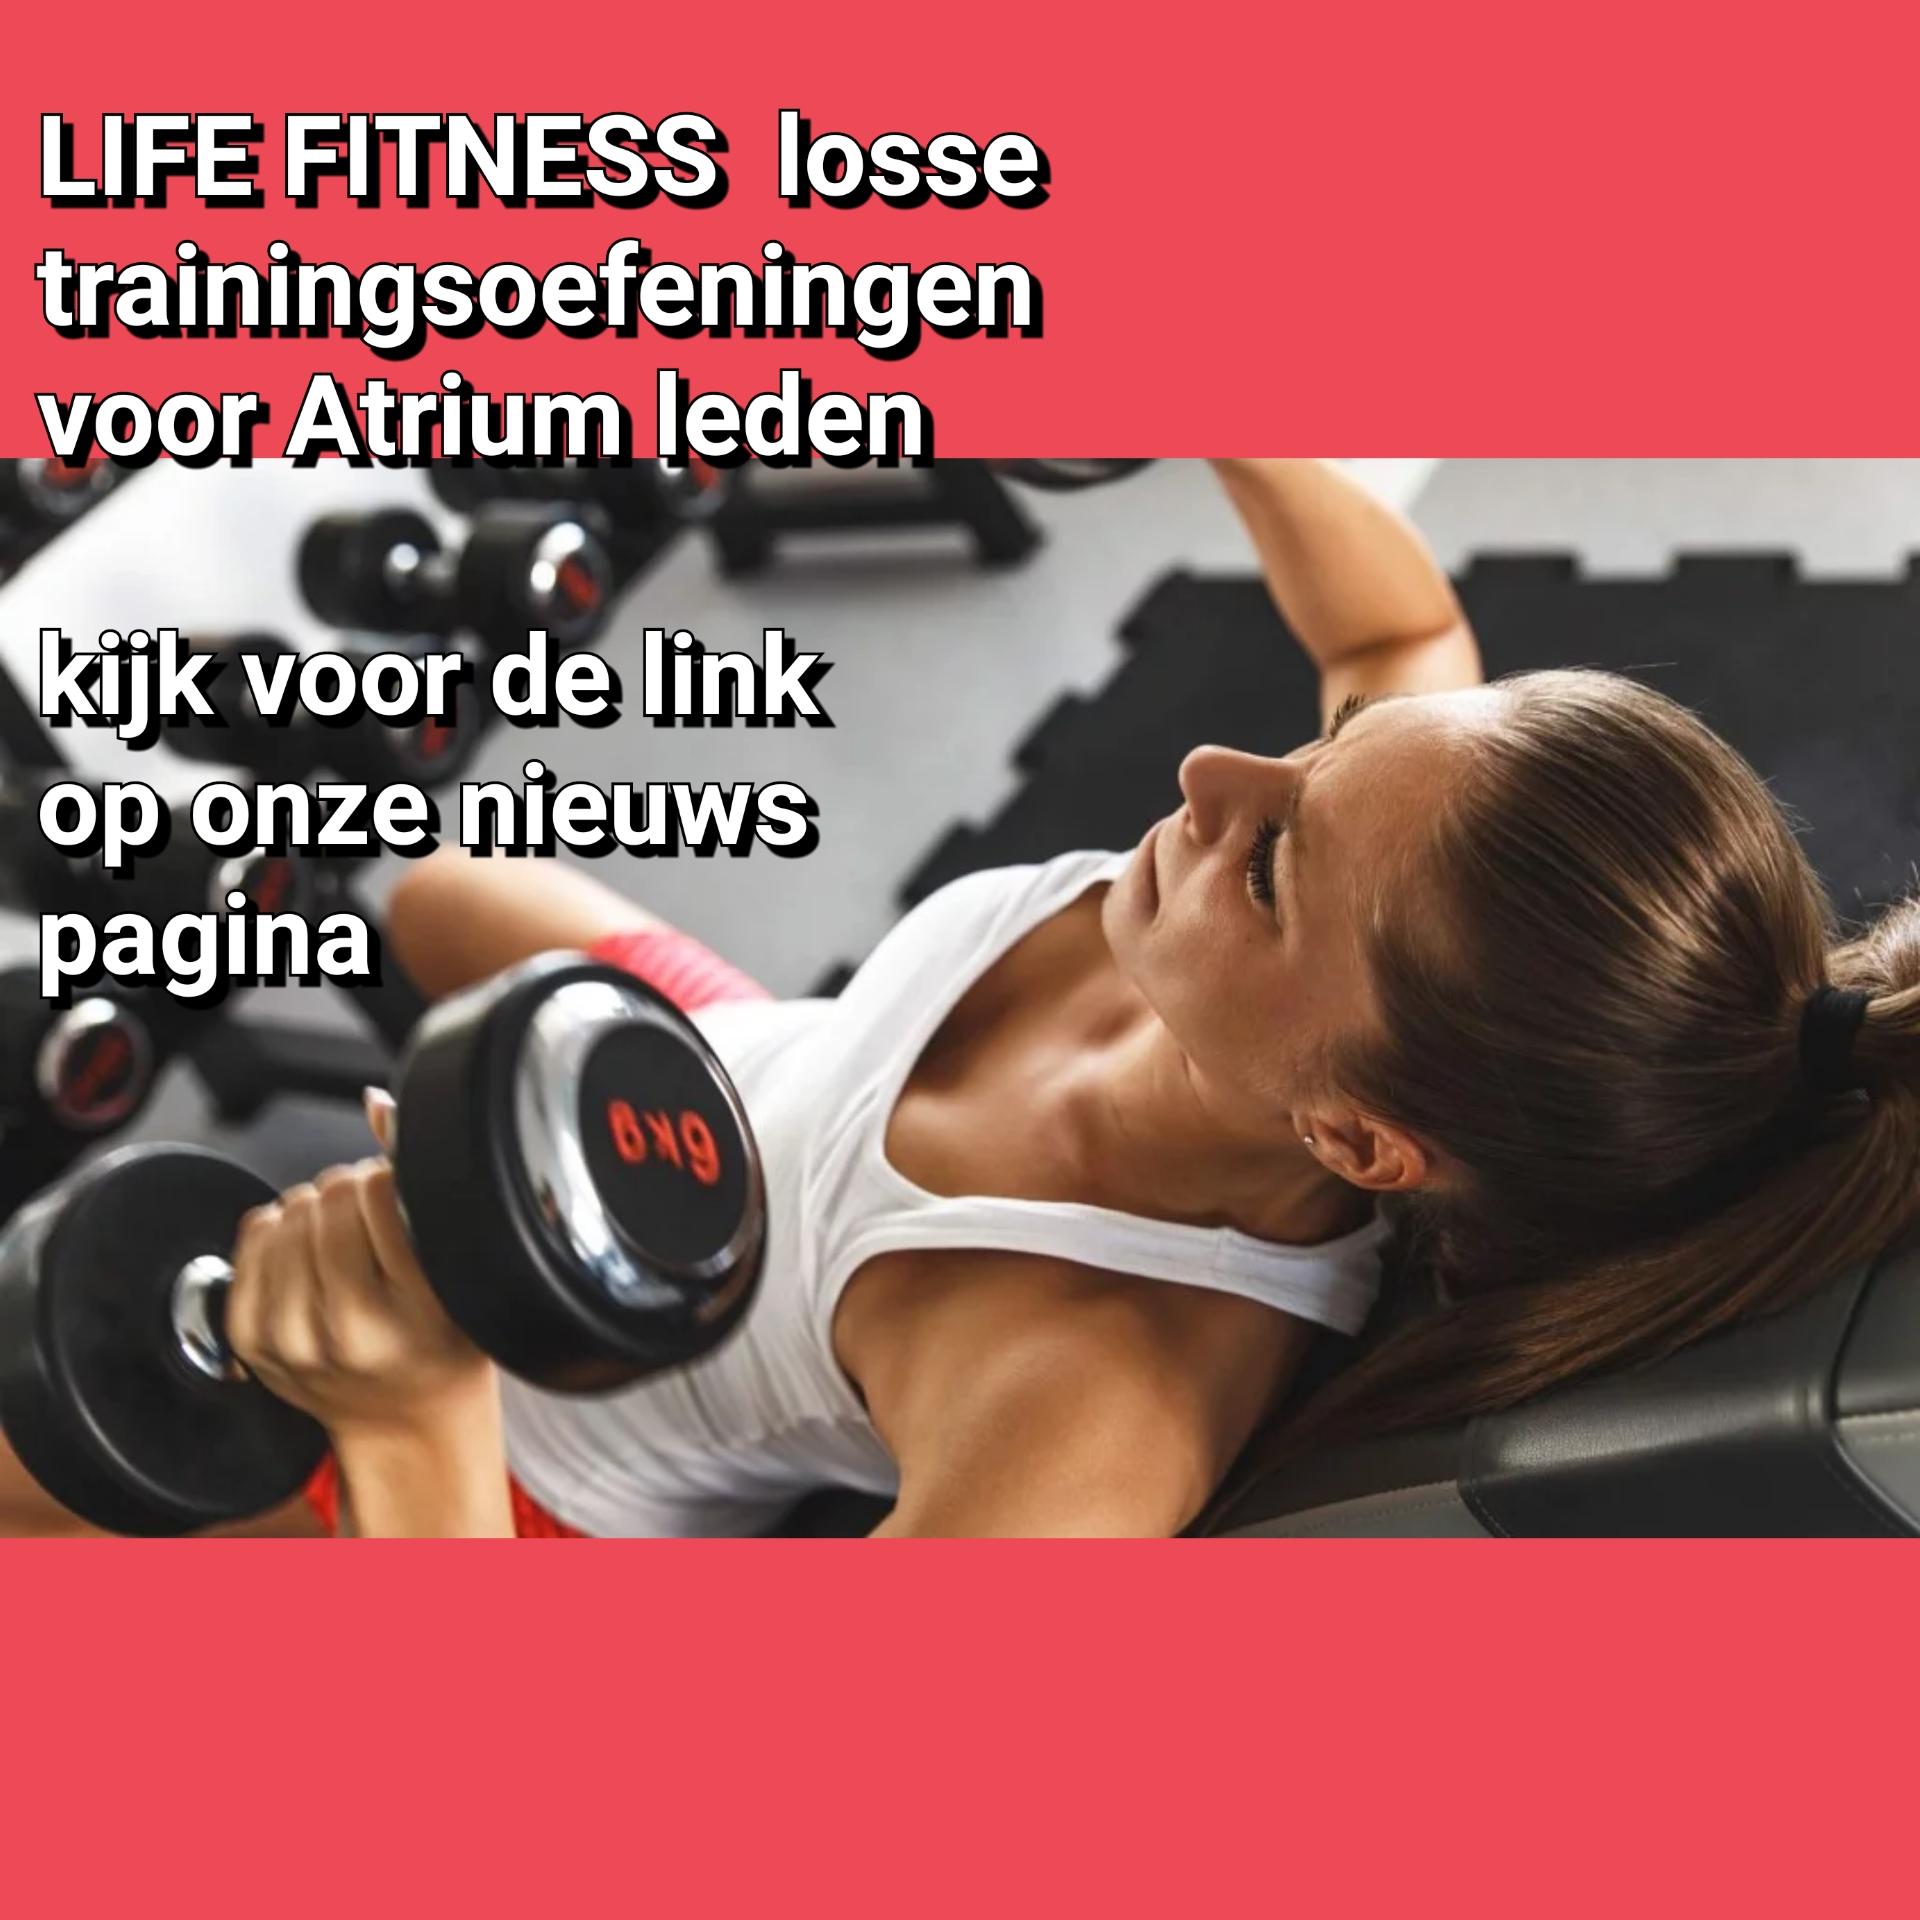 Life fitness losse oefeningen